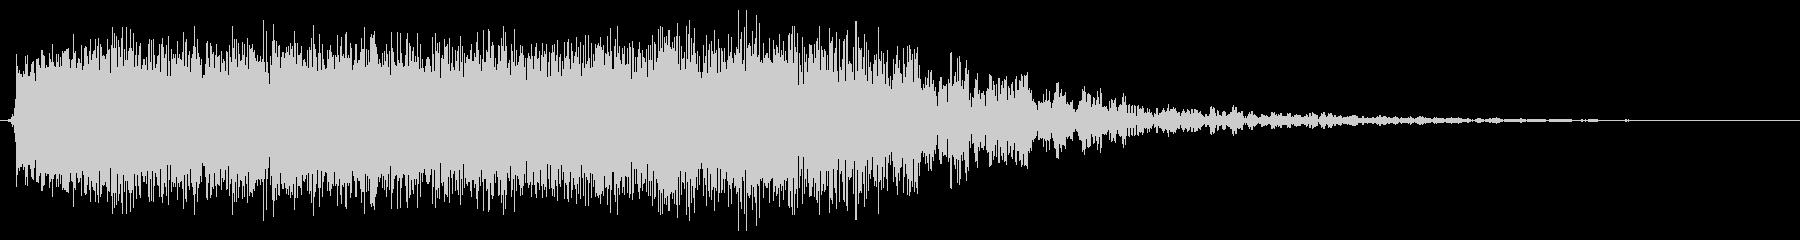 Big Echoey Sputter 3の未再生の波形